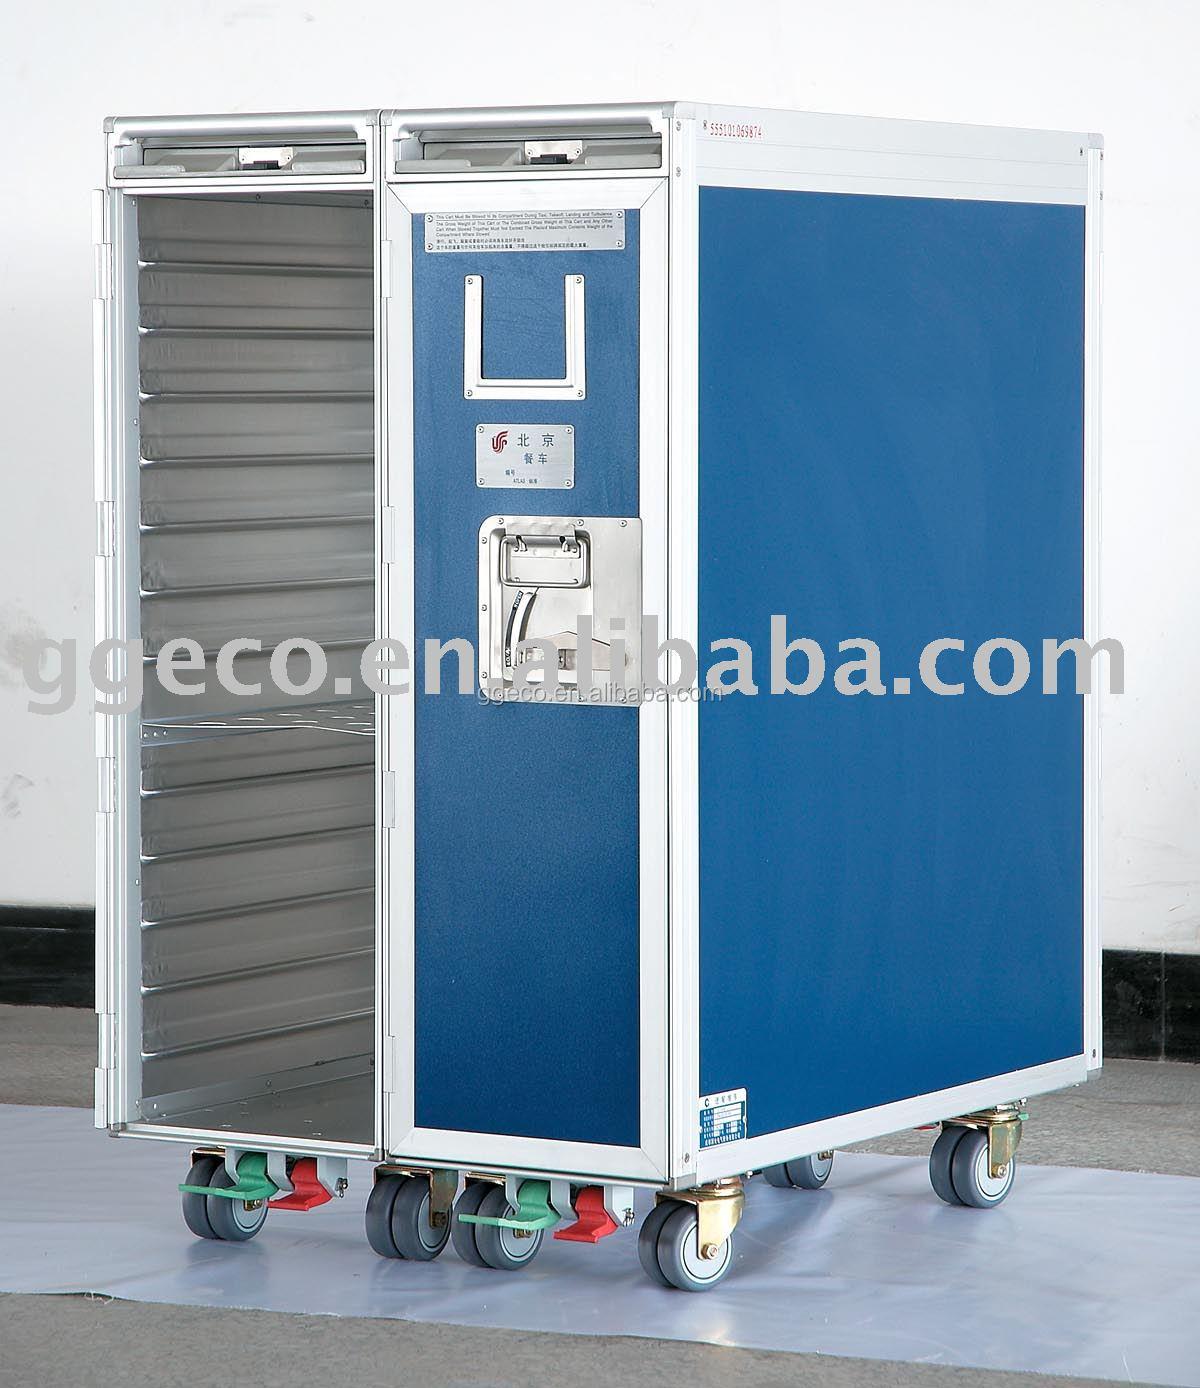 atlas kssu aircraft galley equipment aviation inflight. Black Bedroom Furniture Sets. Home Design Ideas